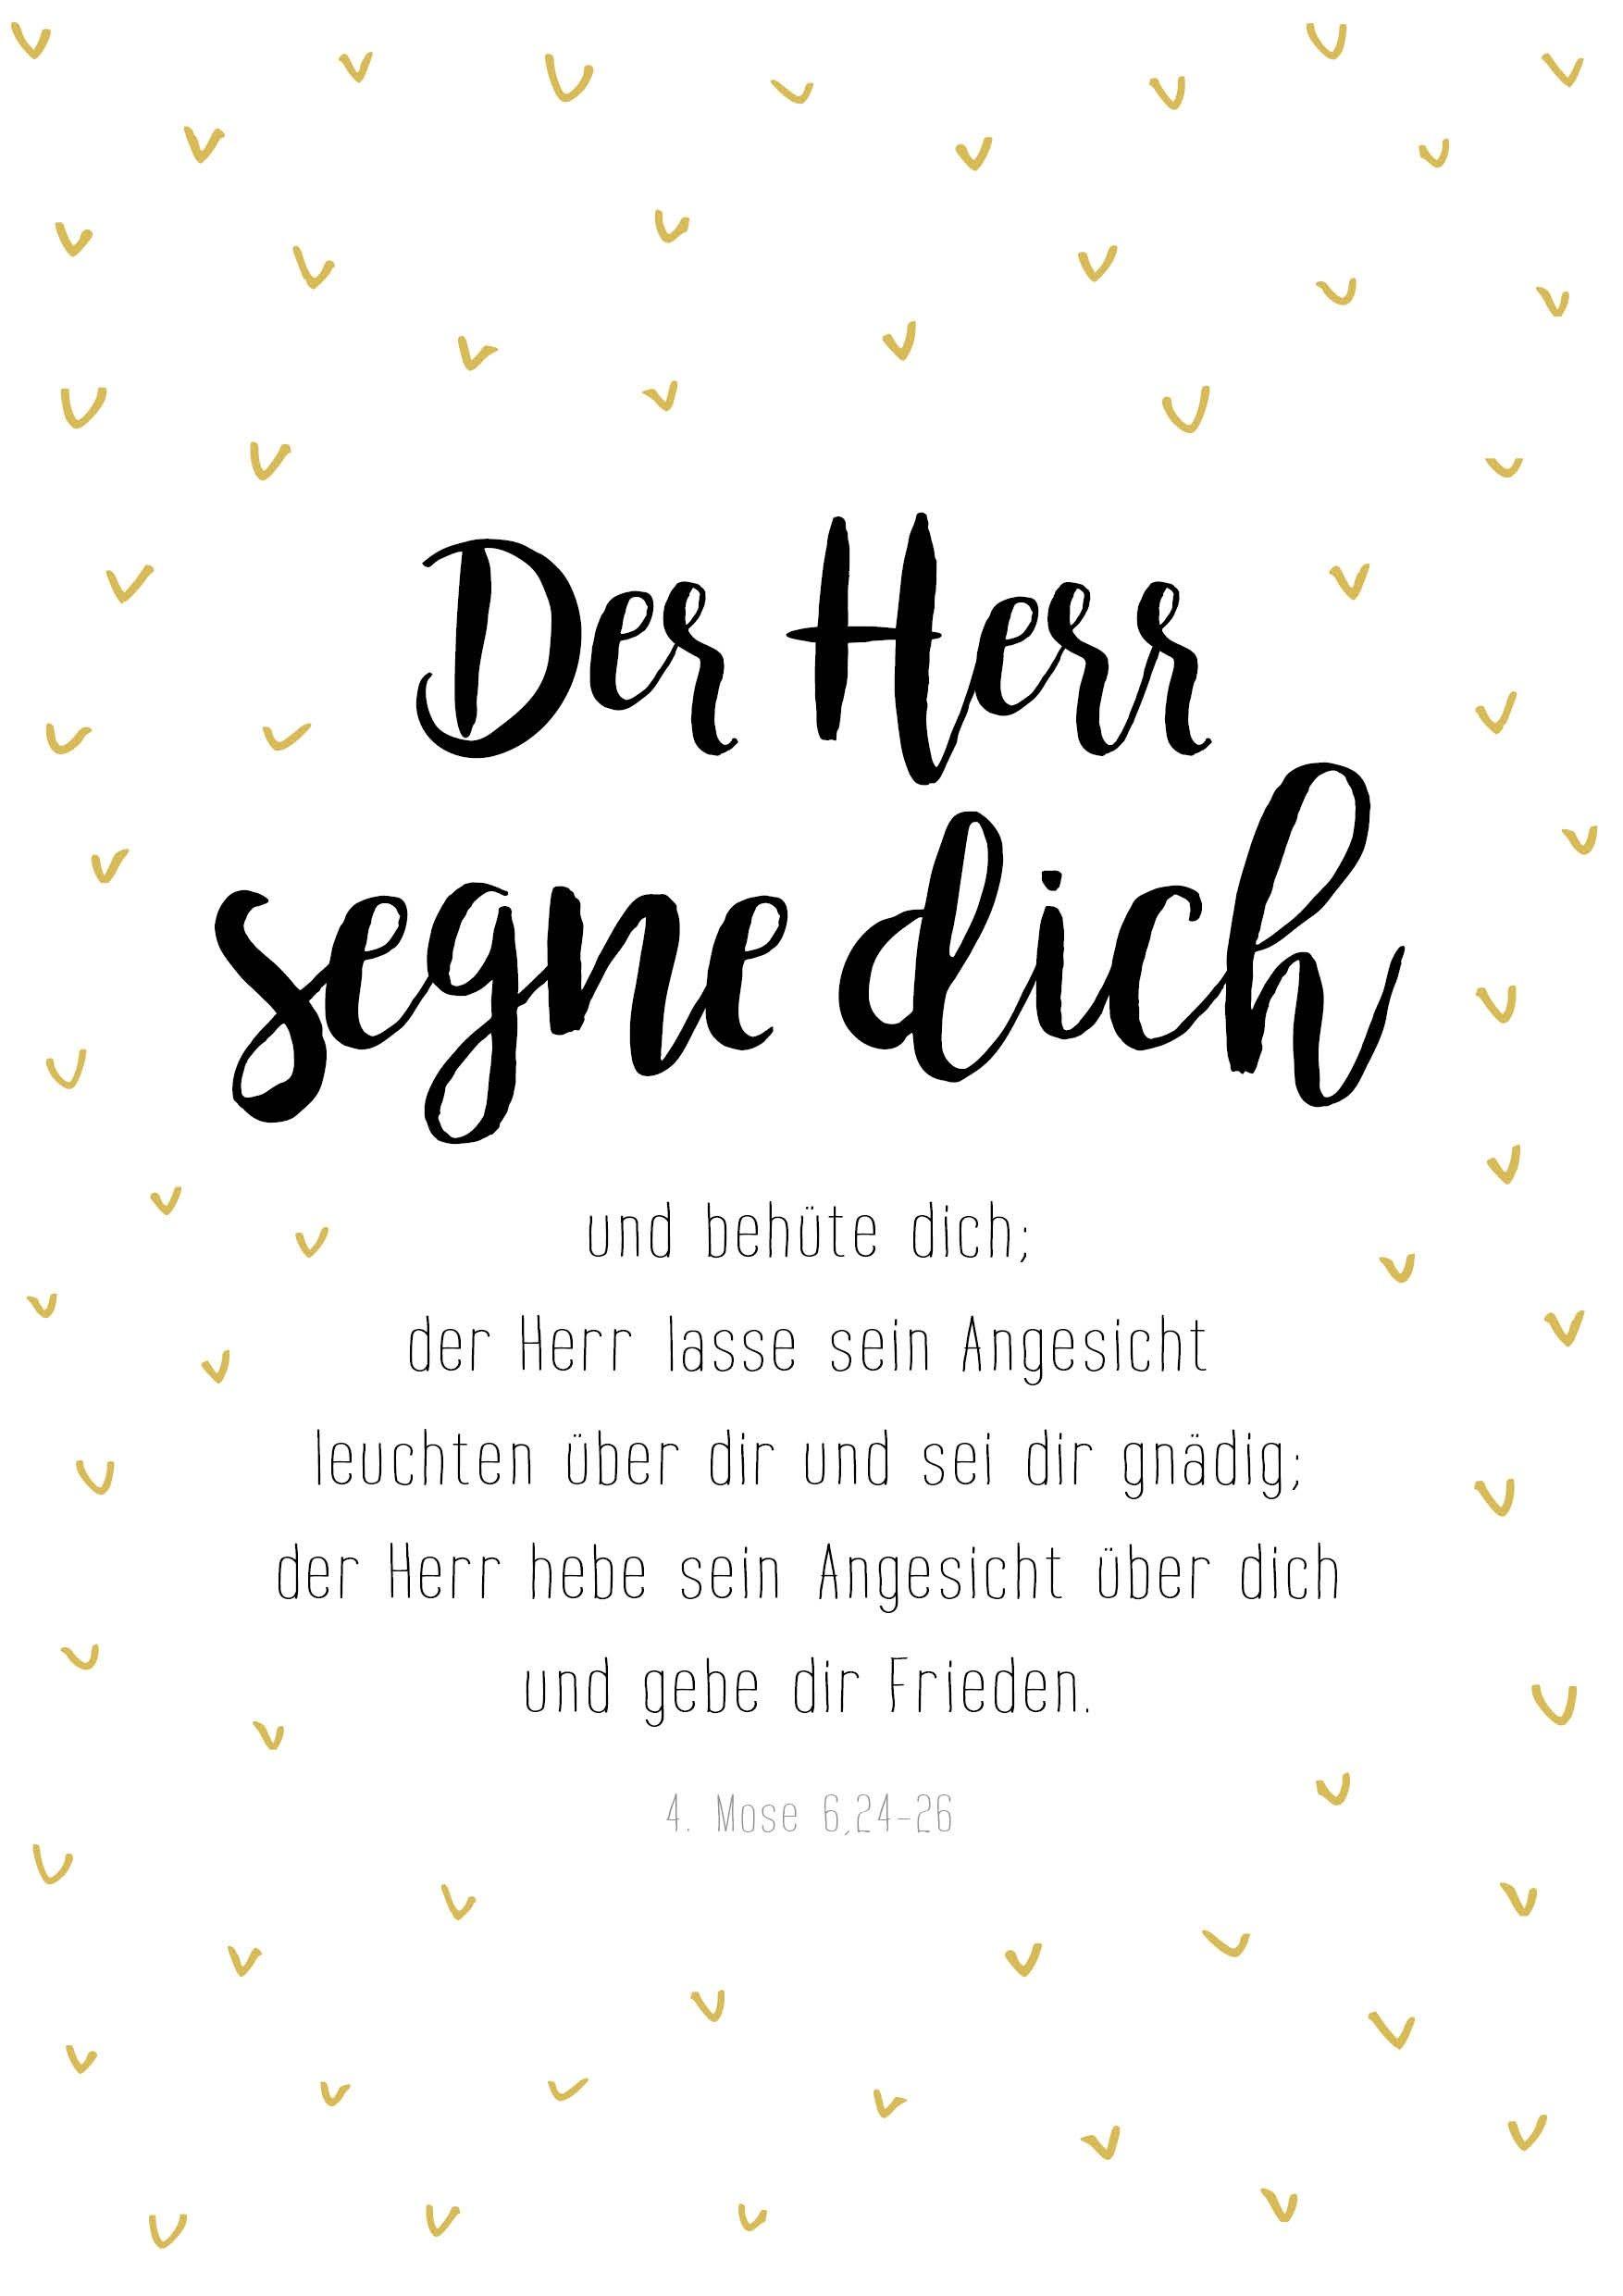 Poster: Der Herr segne dich - A3